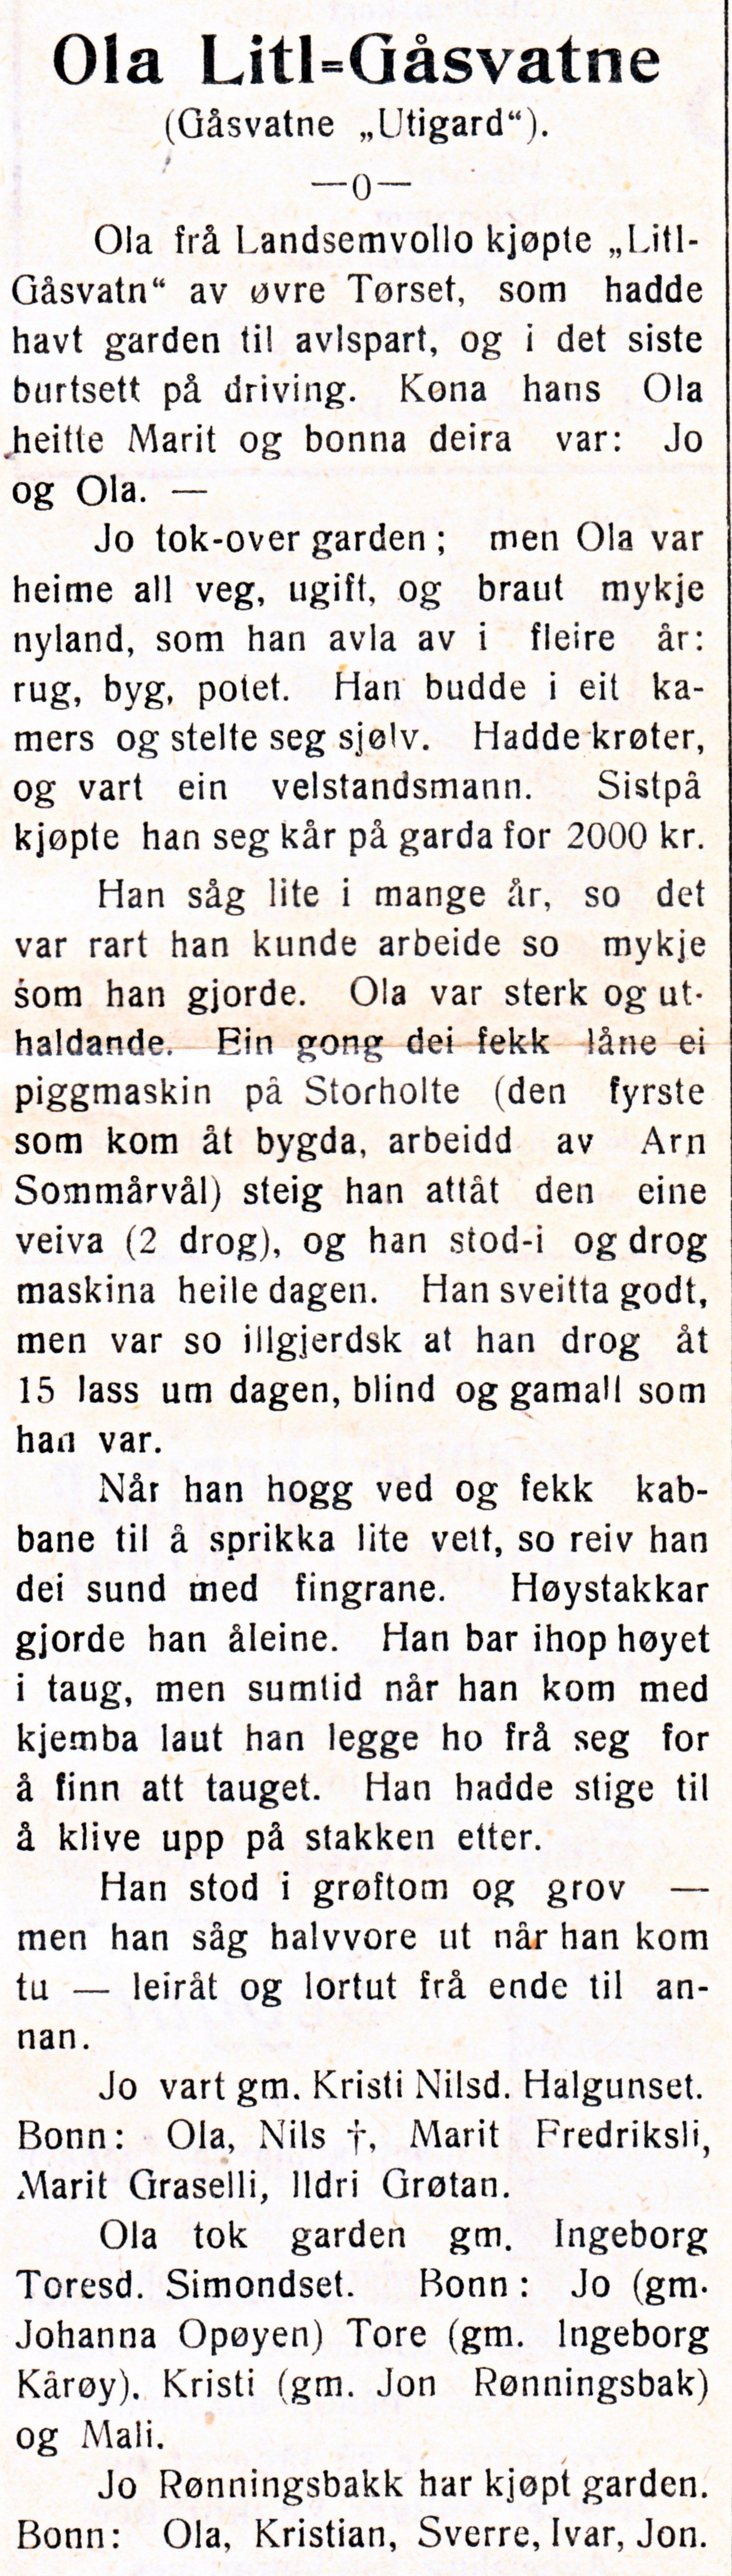 Ola Litj-Gåsvatne[1].jpg